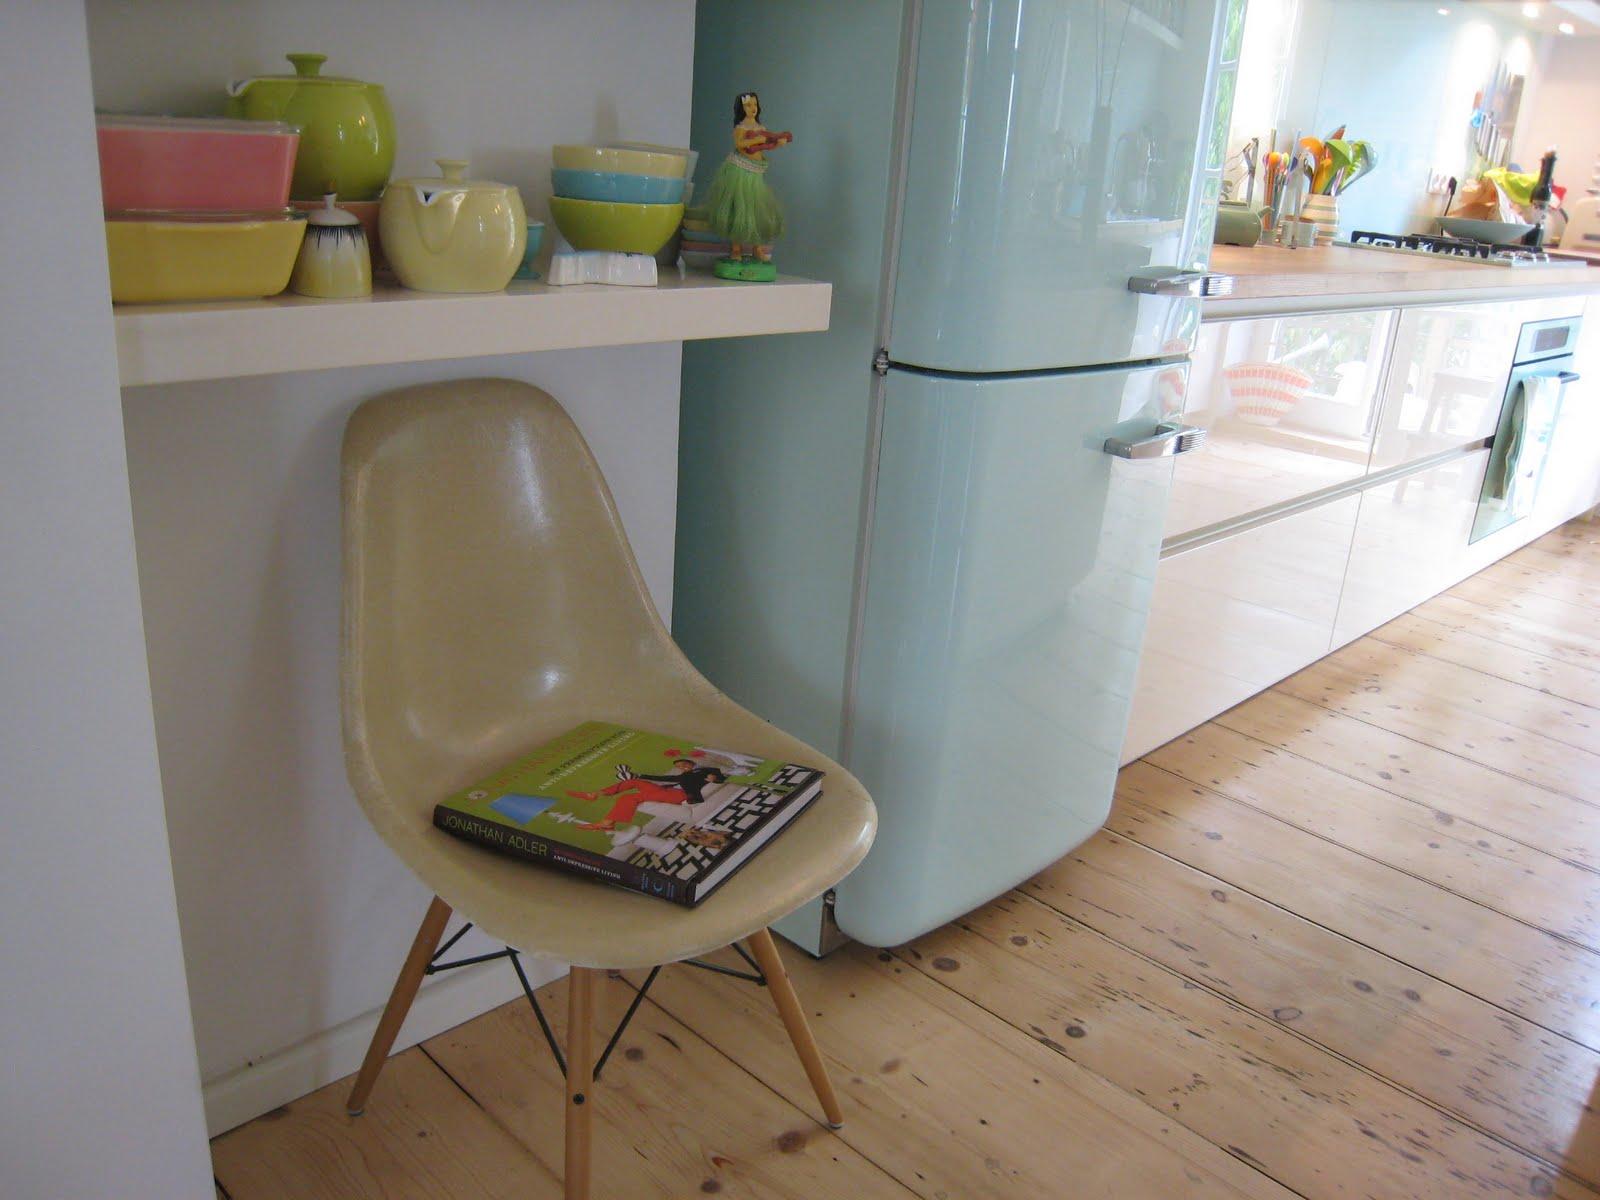 Smeg Kühlschrank Mintgrün : Küche mintgrün beliebt kücheninsel mit essplatz küchen inspiration